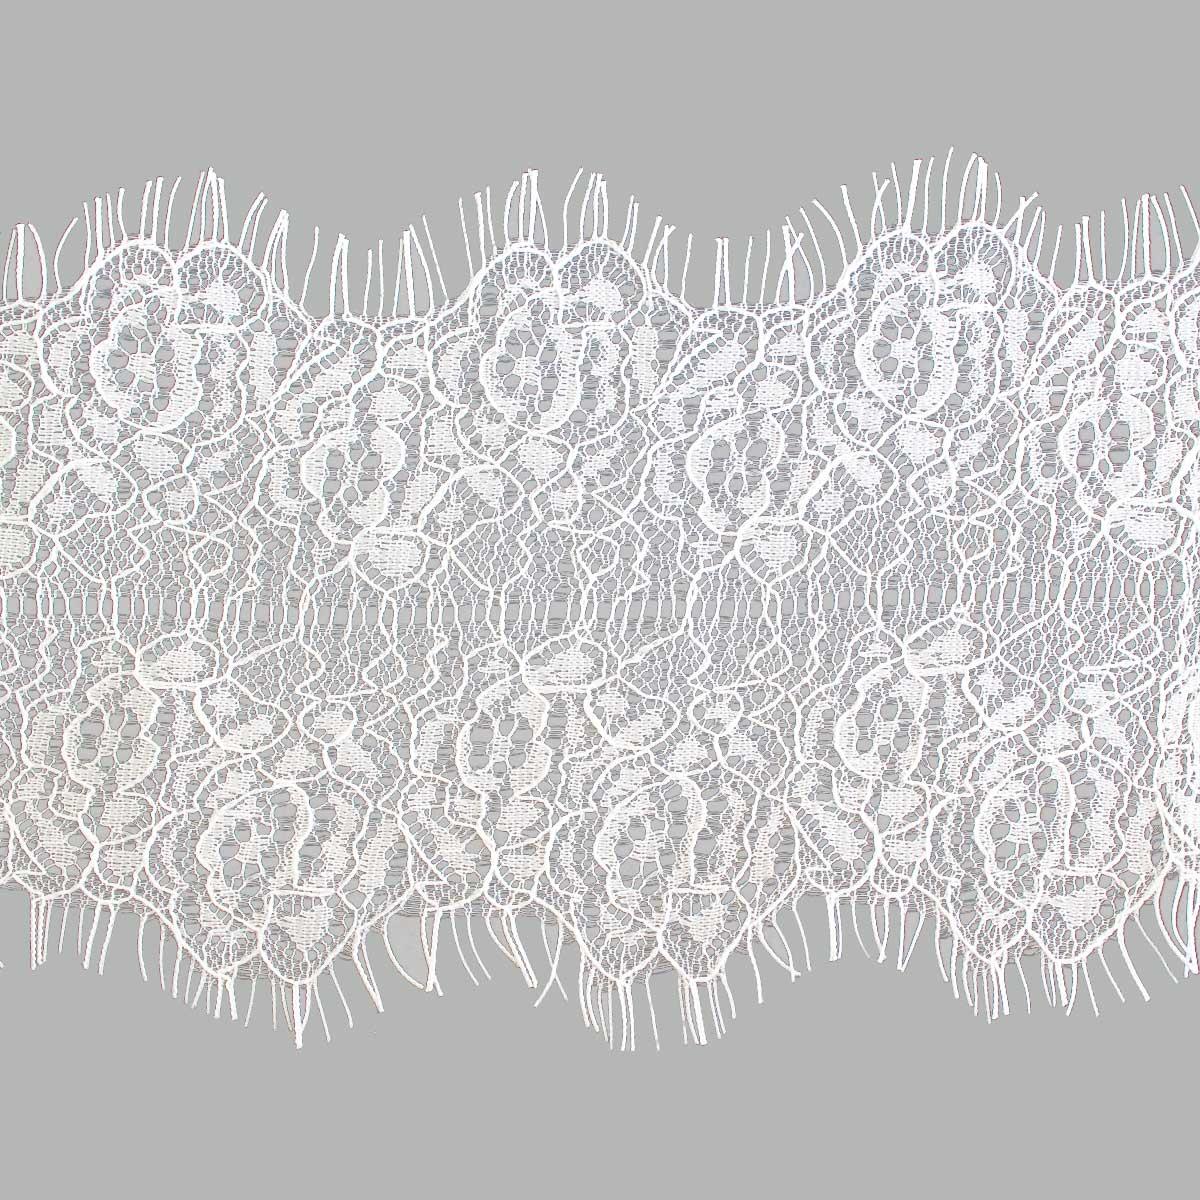 SJ036 Кружево 'Шантильи' на сетке 9,5см*3м, белый